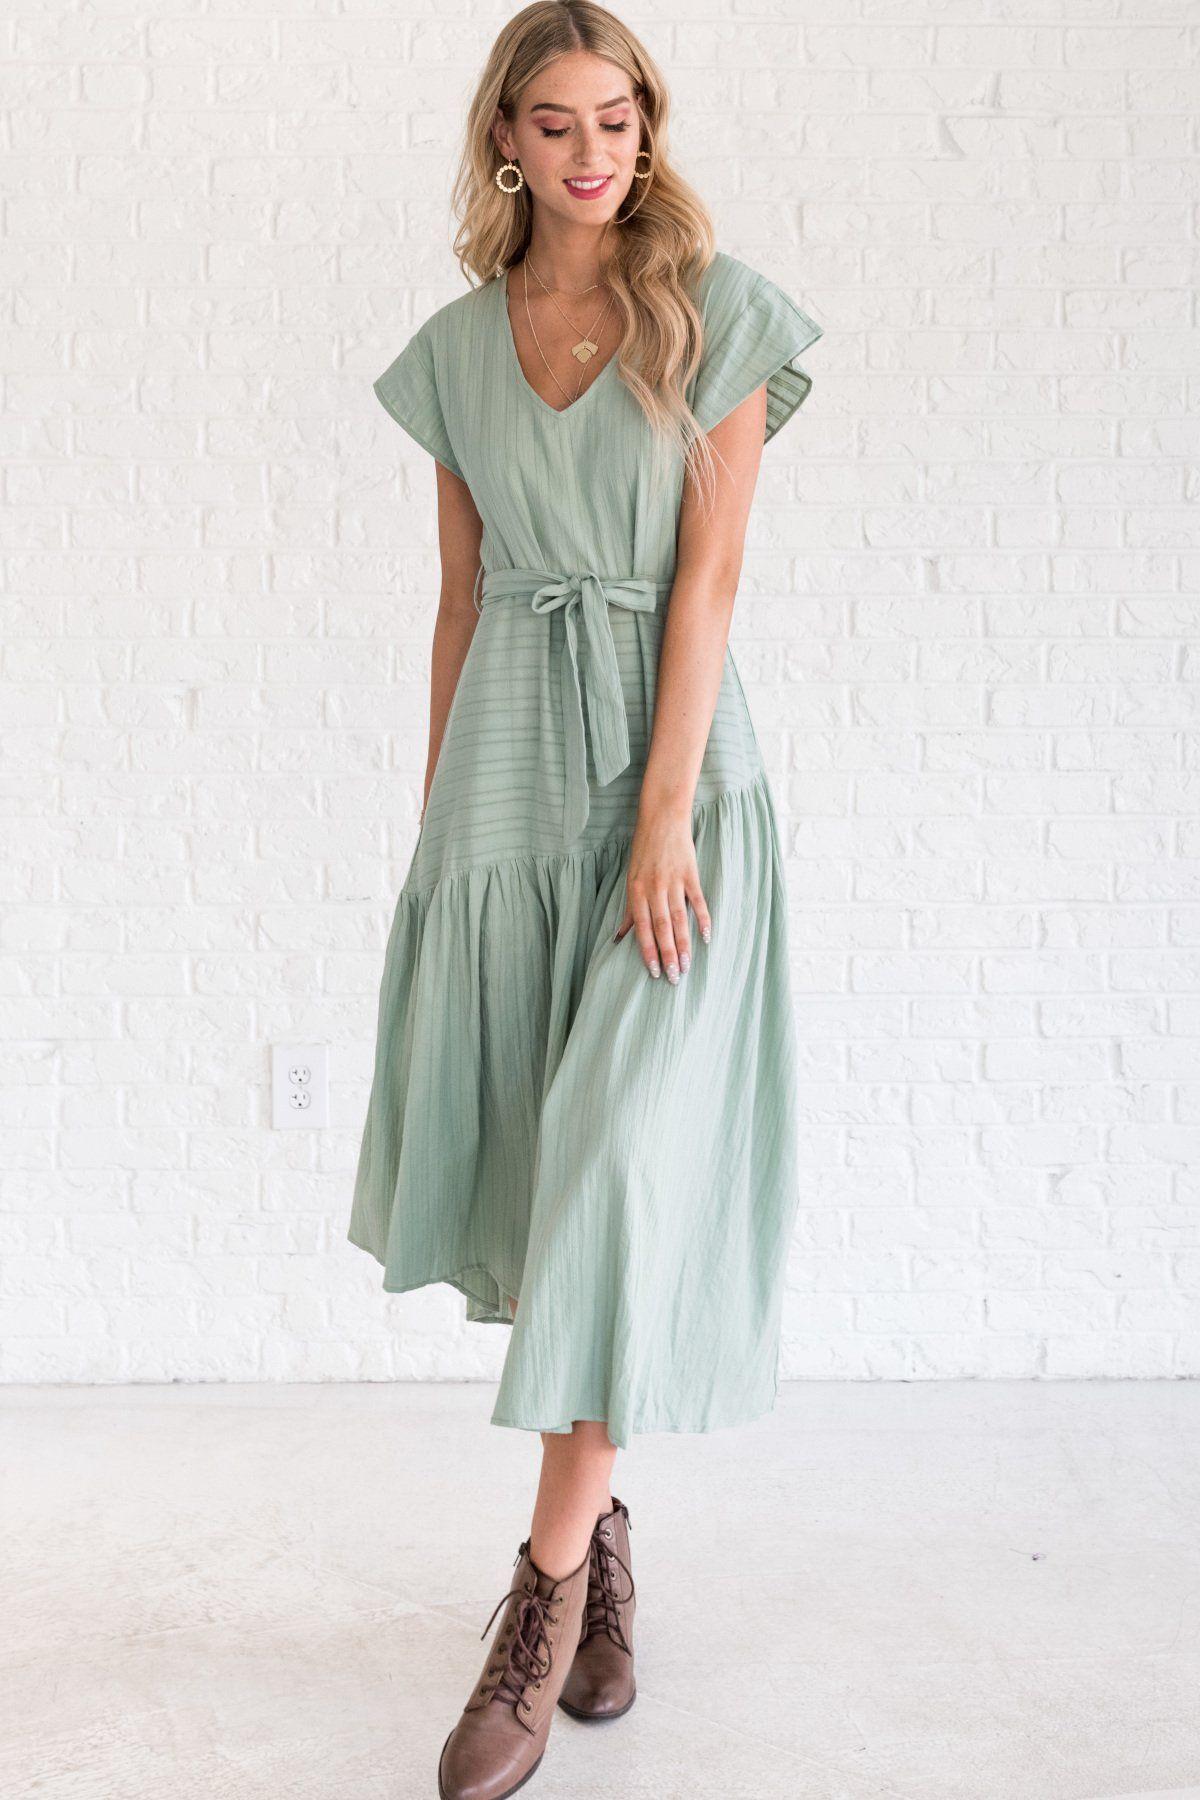 Countryside views sage dress sagegreendress sage dress